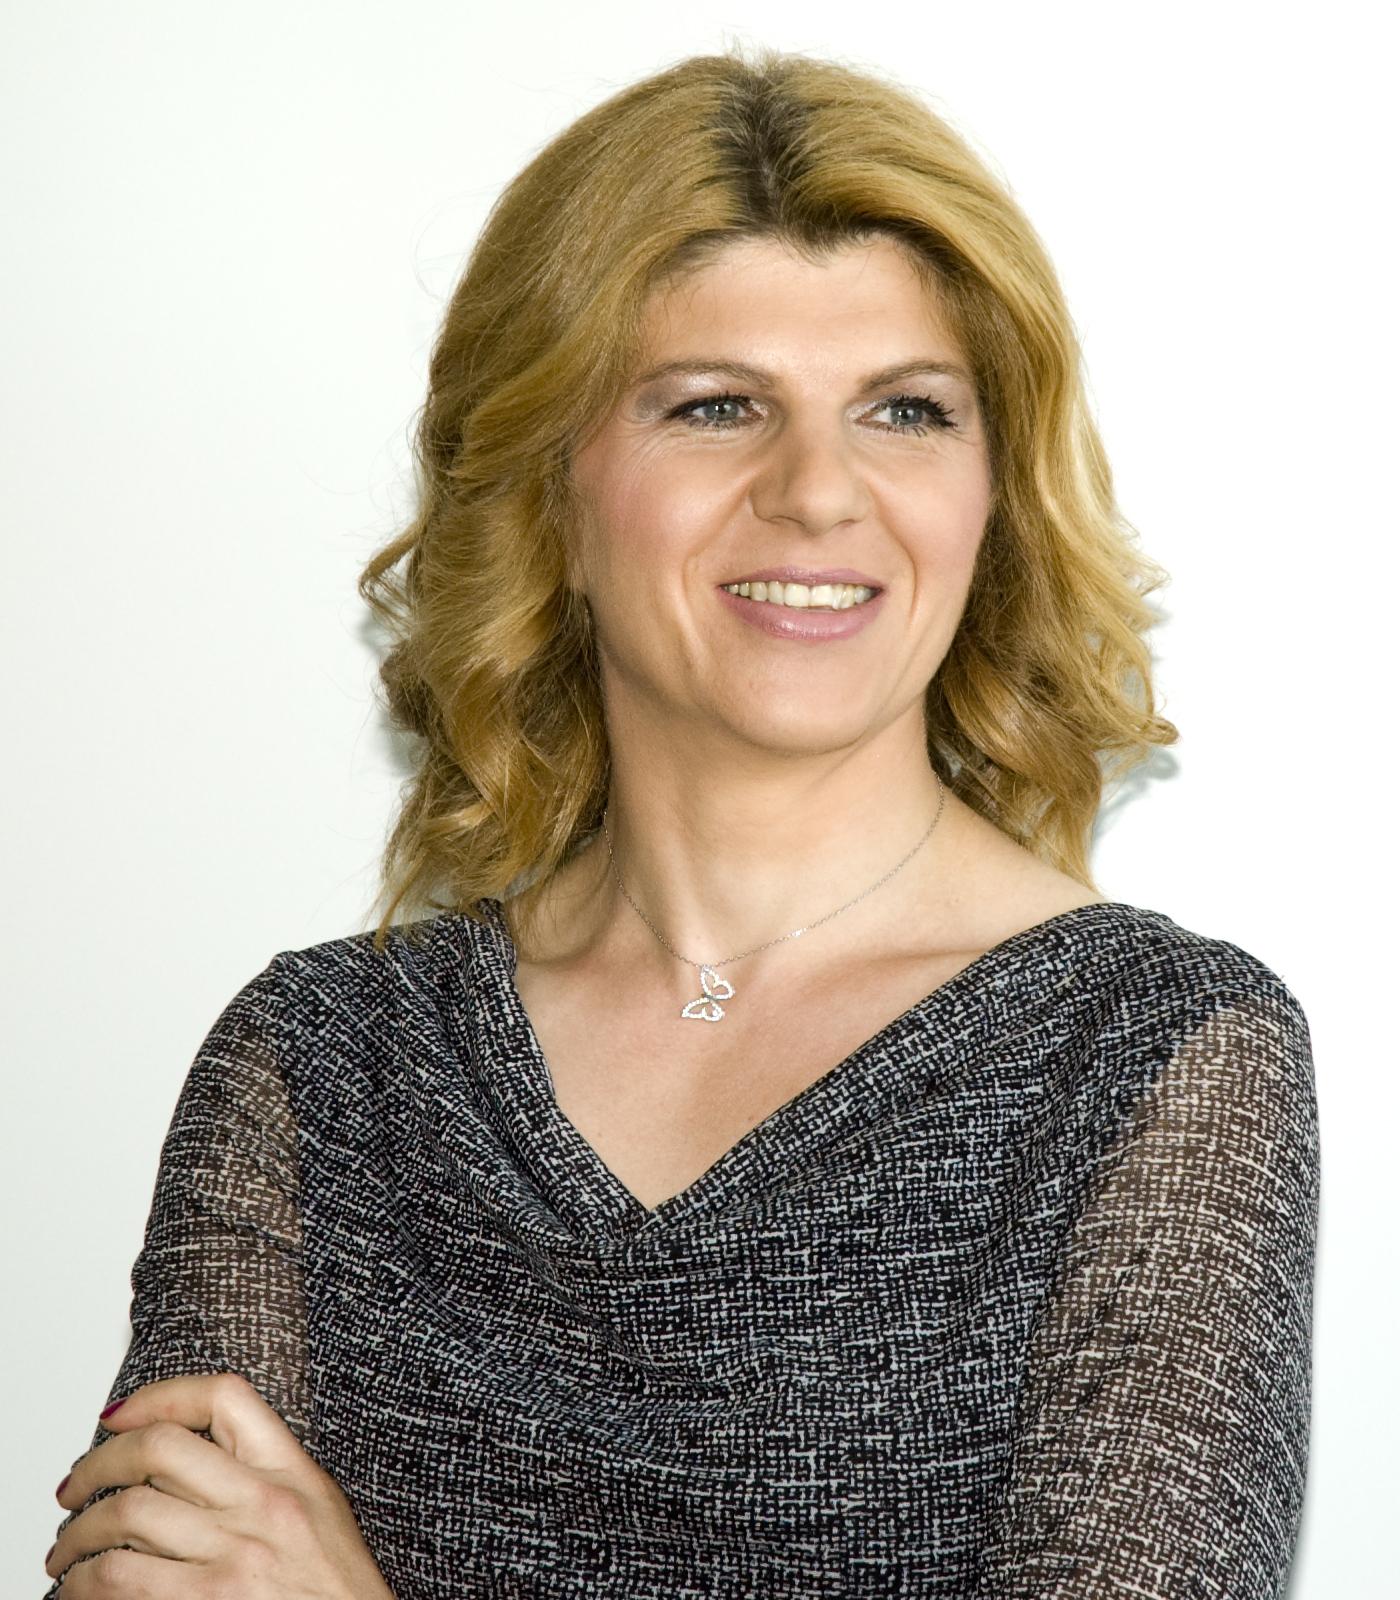 Marina Tonžetić, partnerica u Deloitteu